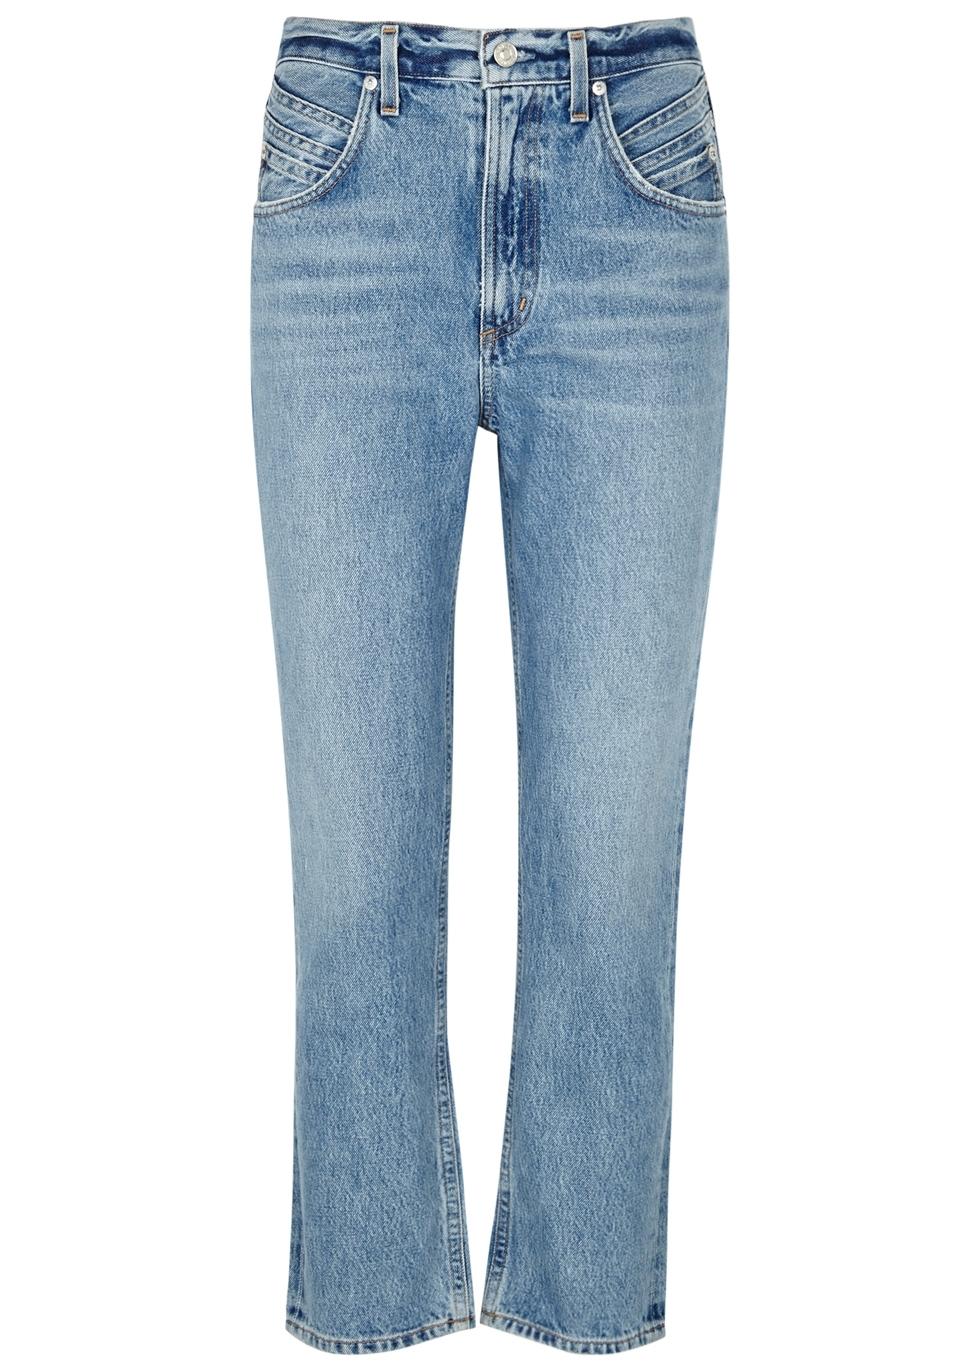 AGOLDE - Denim Skirts - Retro Jeans - LA Fashion - Harvey Nichols